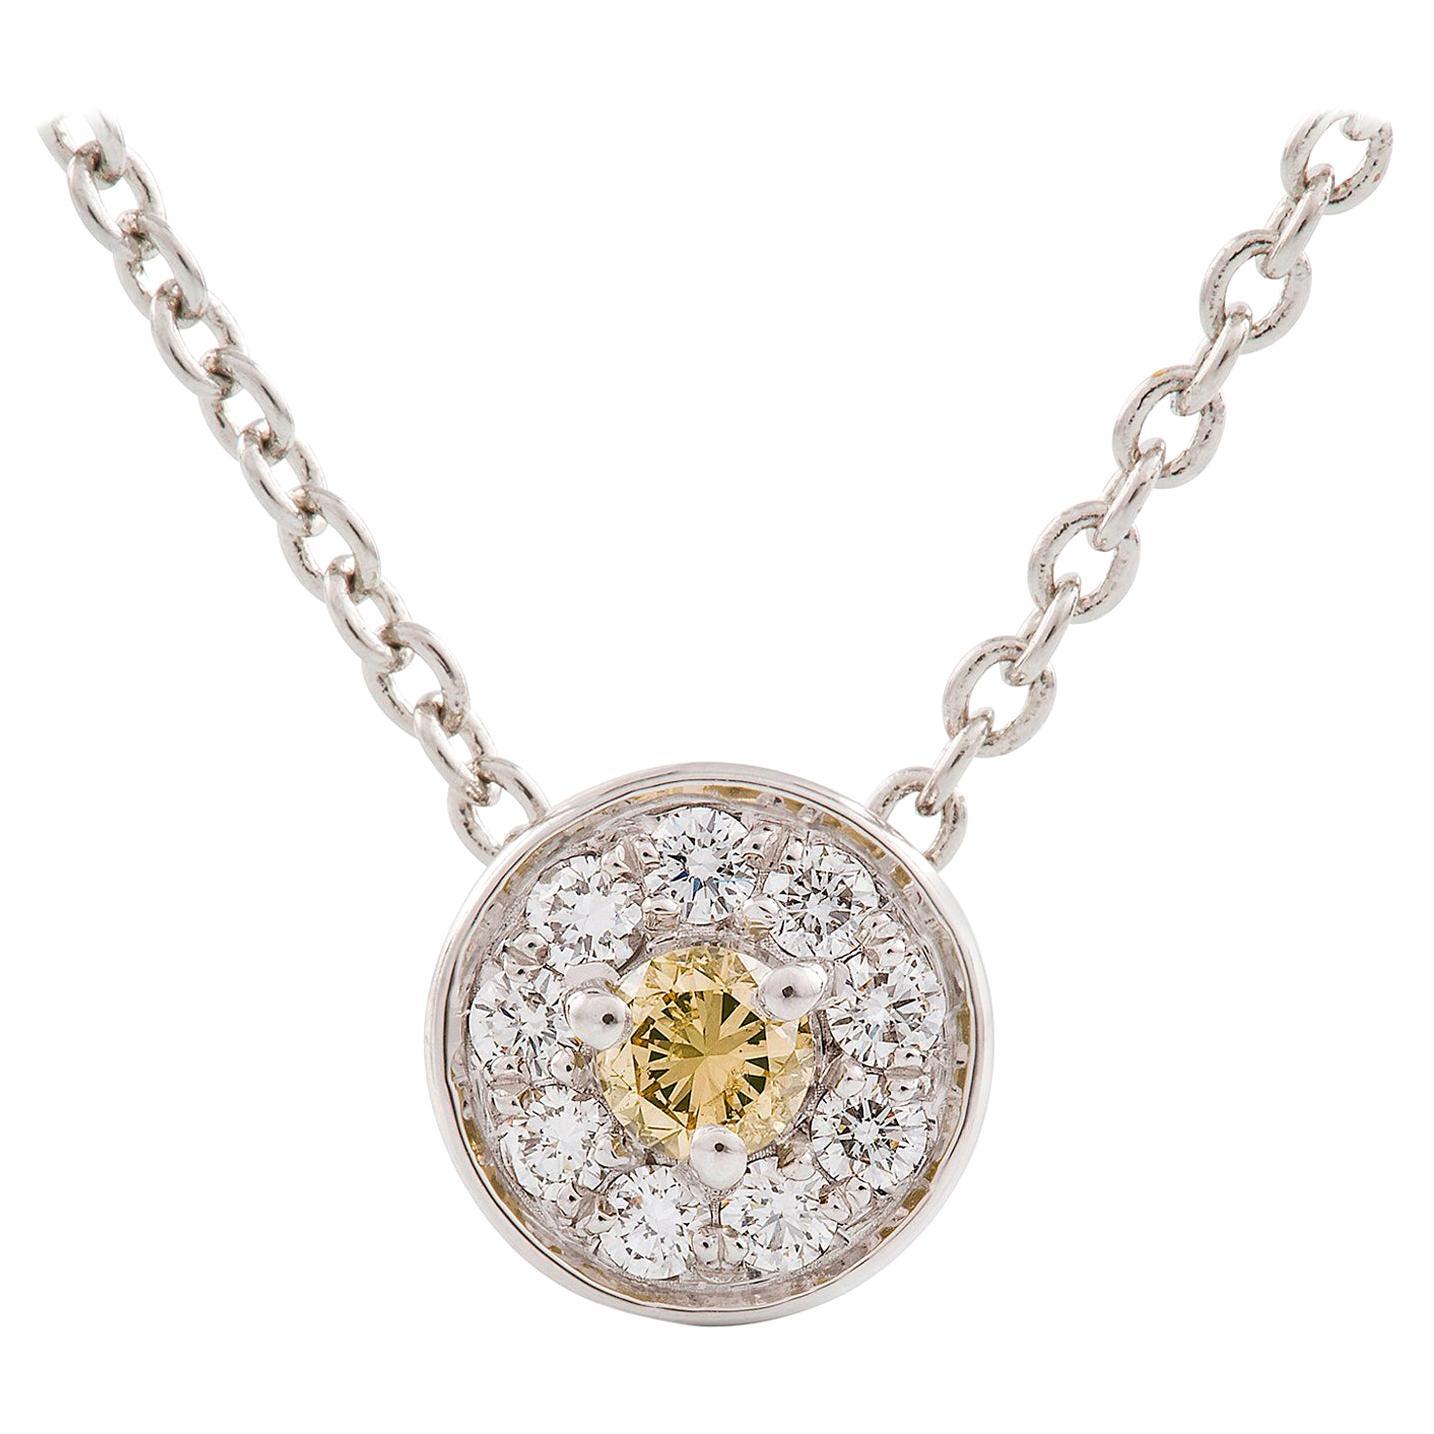 Kian Design Round Brilliant Cut Cluster Diamond Necklace in 18 Carat White Gold